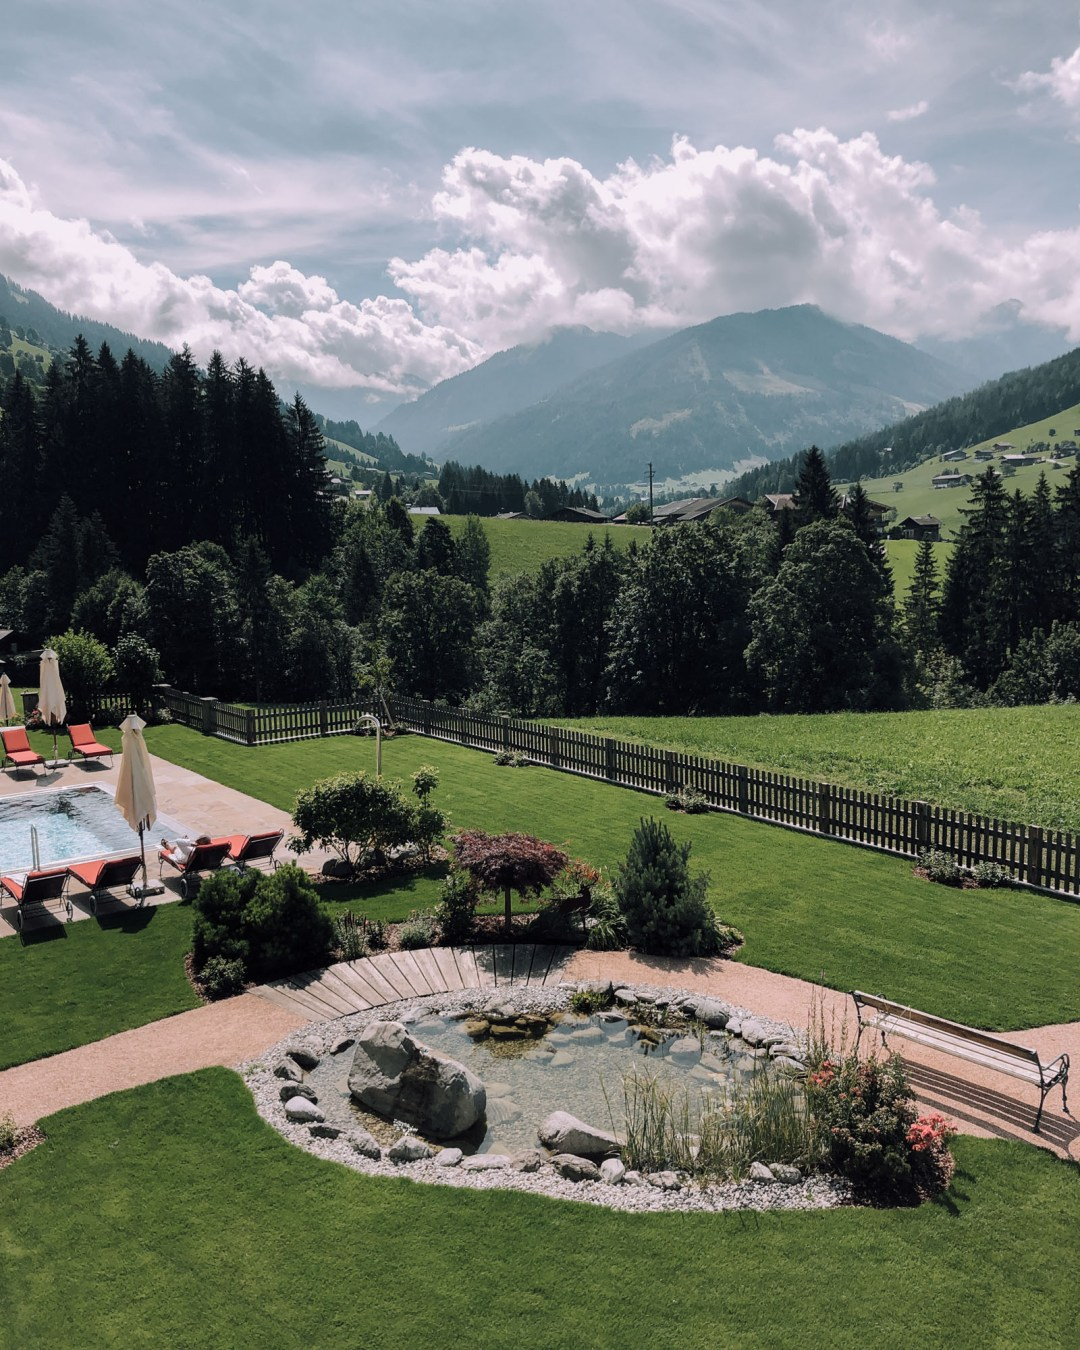 inastil, over50blogger, Alpbach, Alpbacherhof, Tirol, Austria, Visittirol, Wandern, Mountainbike, travelblogger, traveldiary, Urlaub, Urlaubinösterreich-2